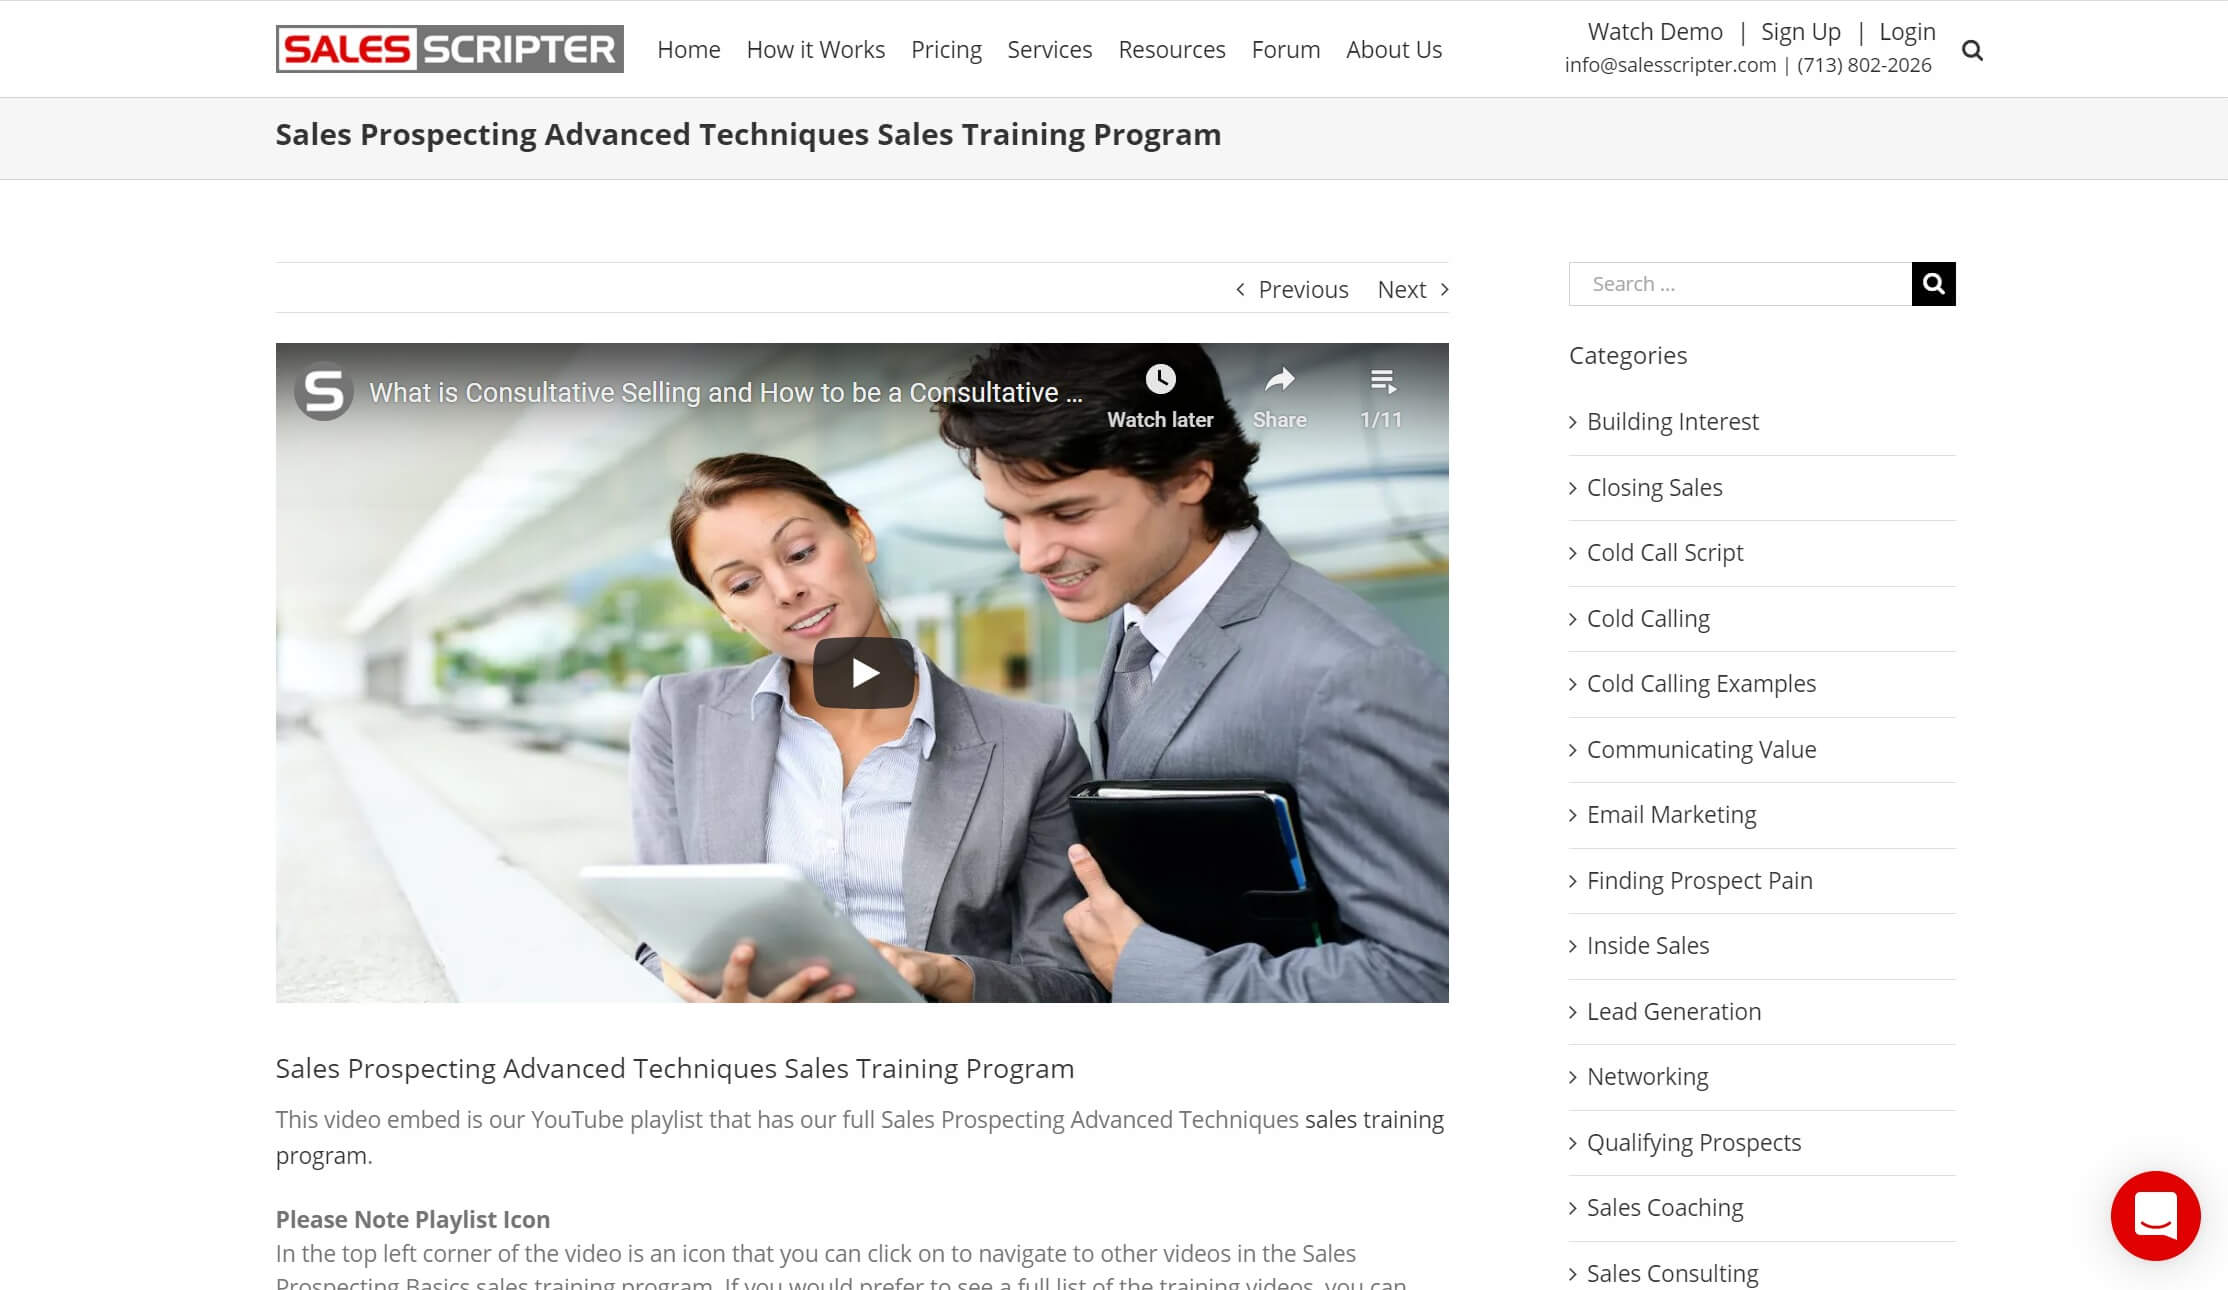 The Sales Prospecting Advanced Techniques online sales training course.